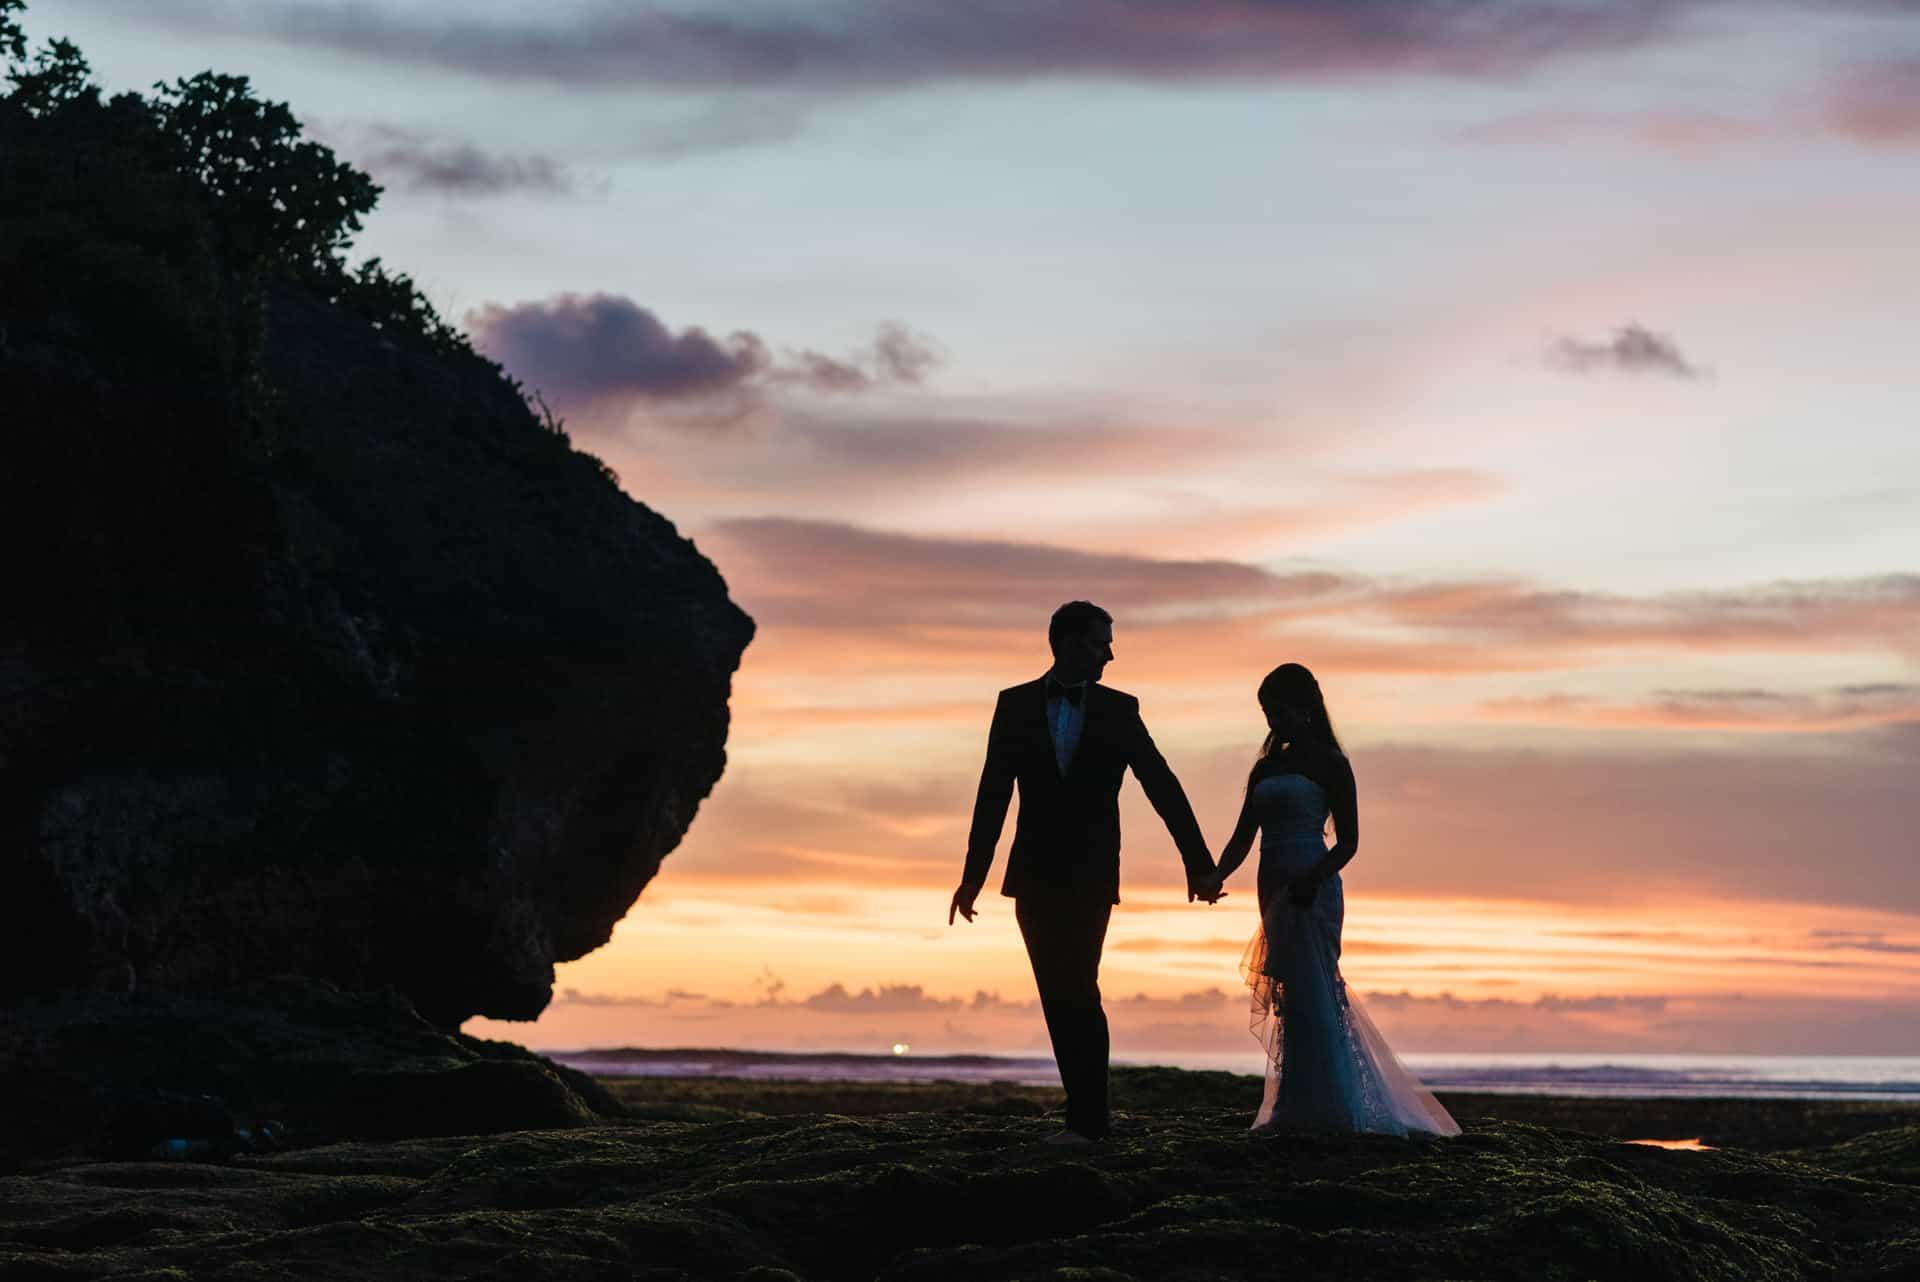 suluban beach sunset